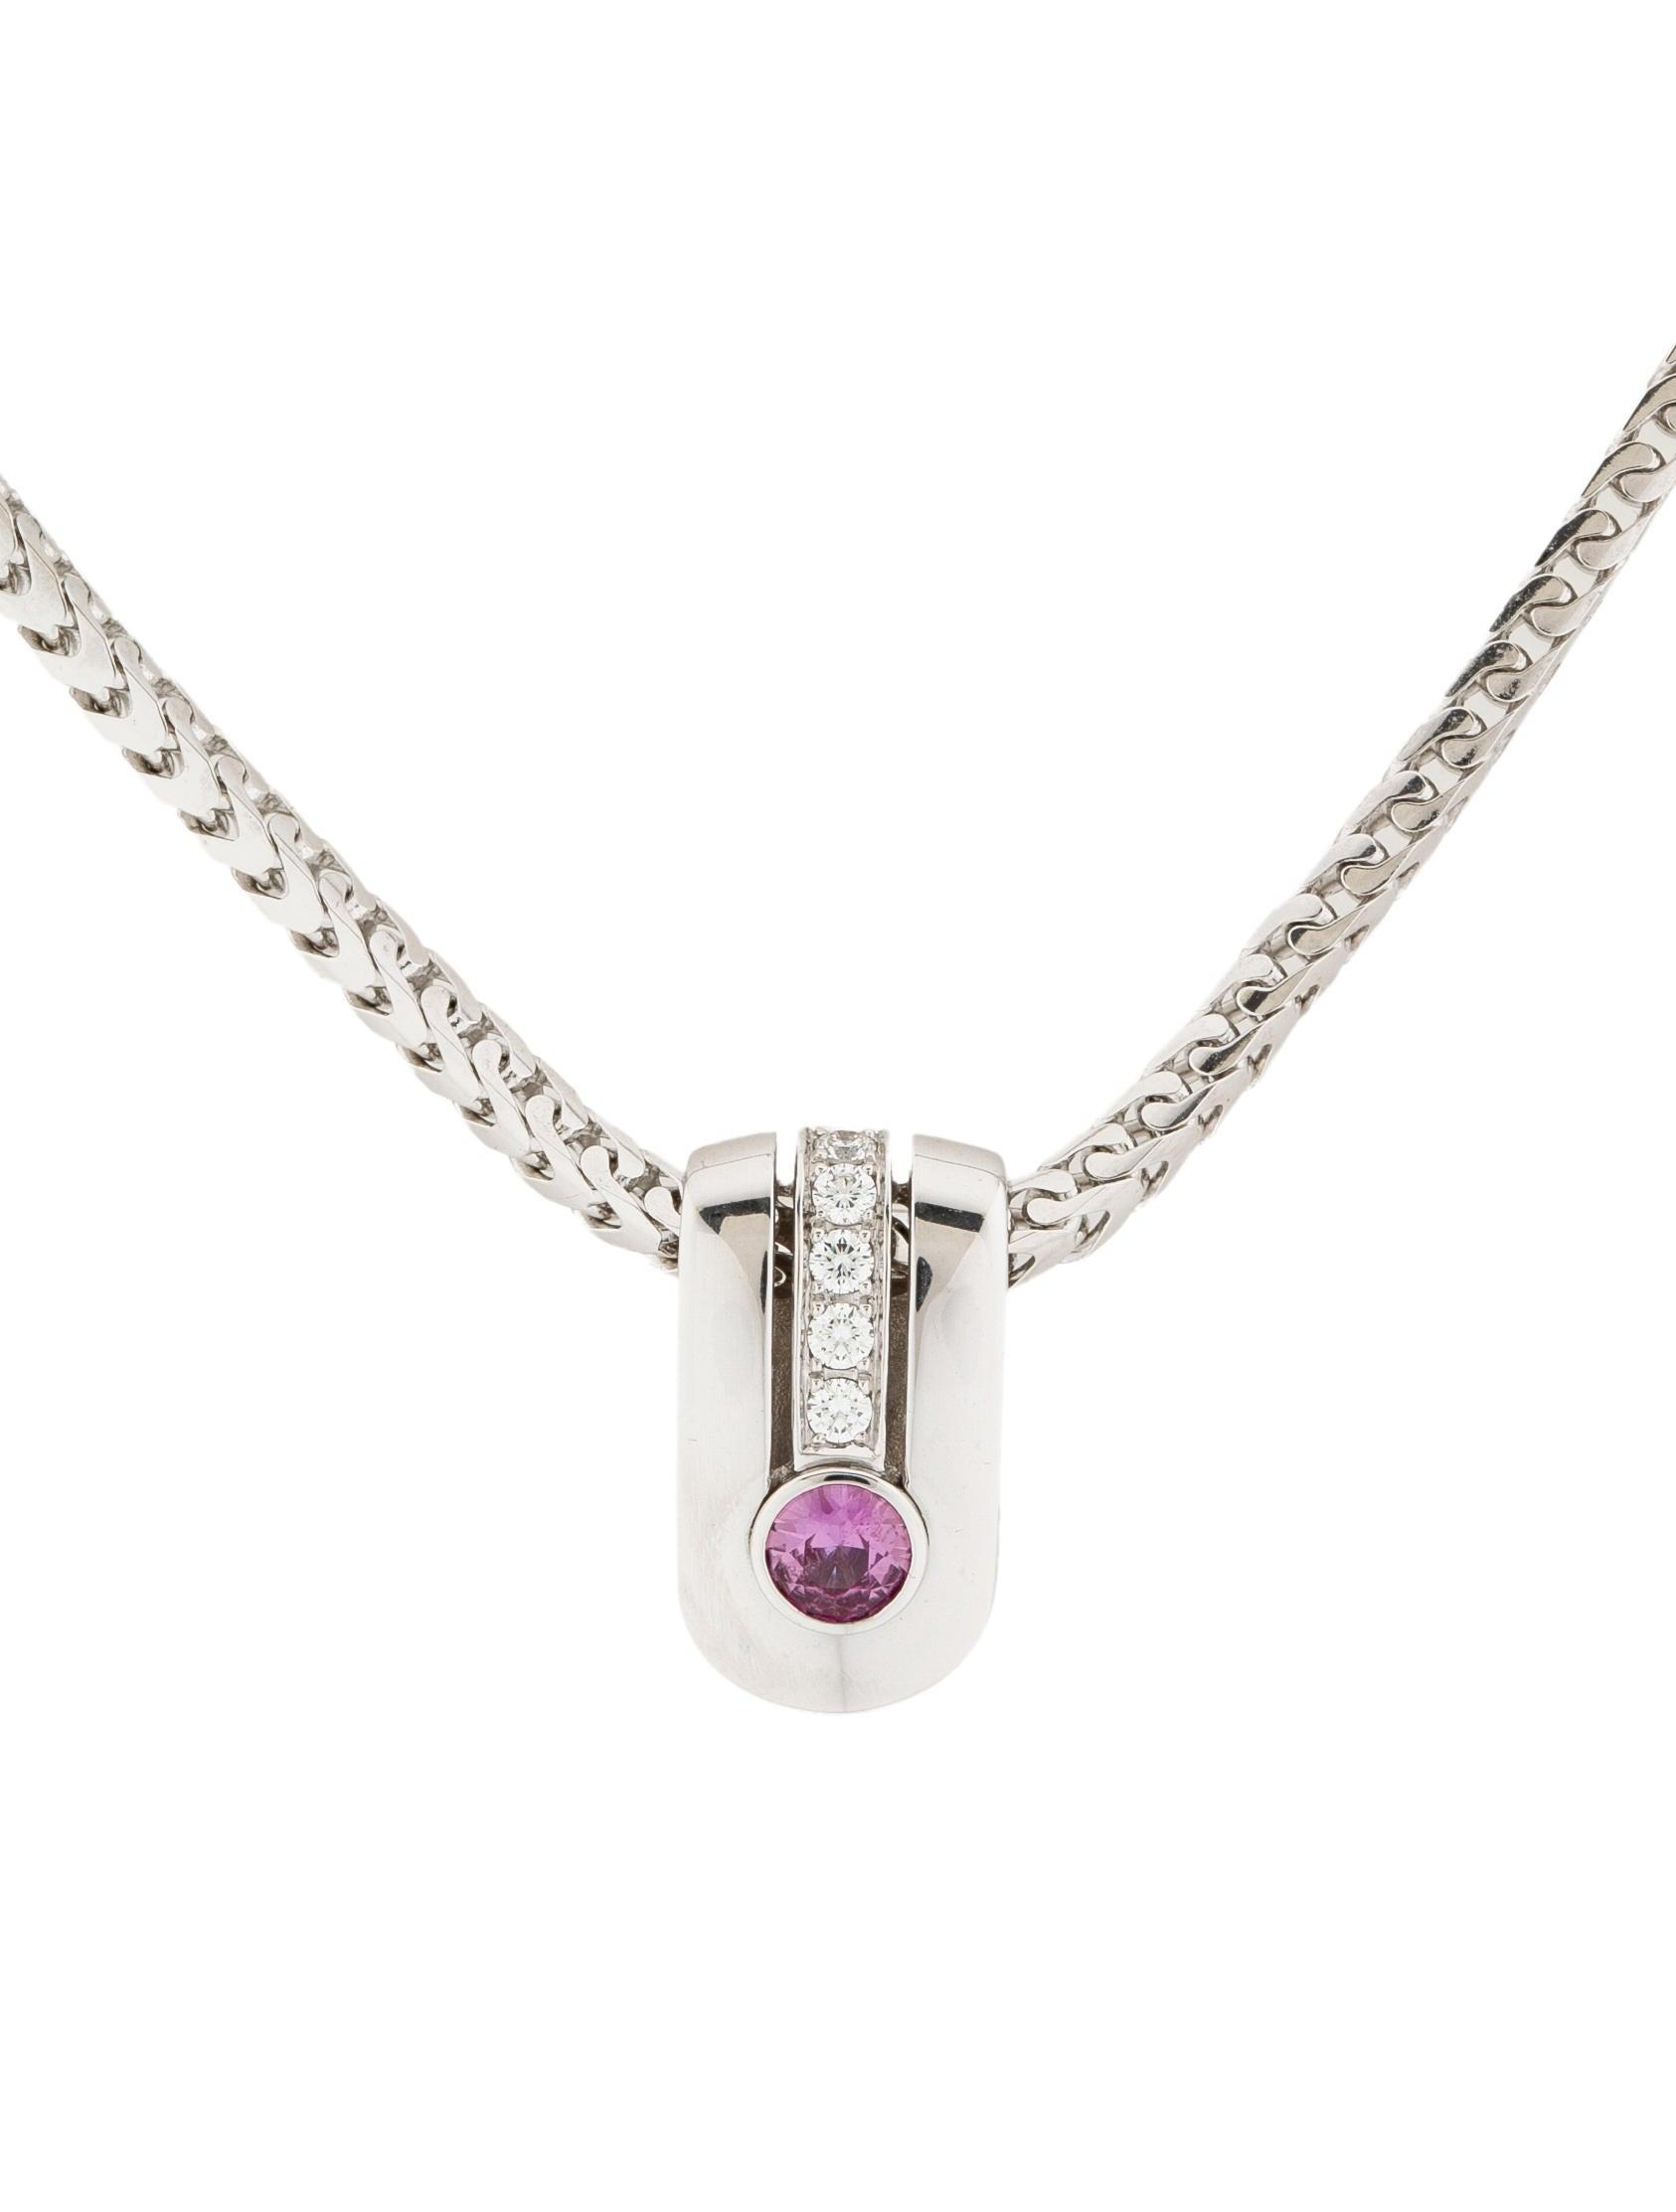 Di Modolo Pink Sapphire and Diamond Necklace Necklaces